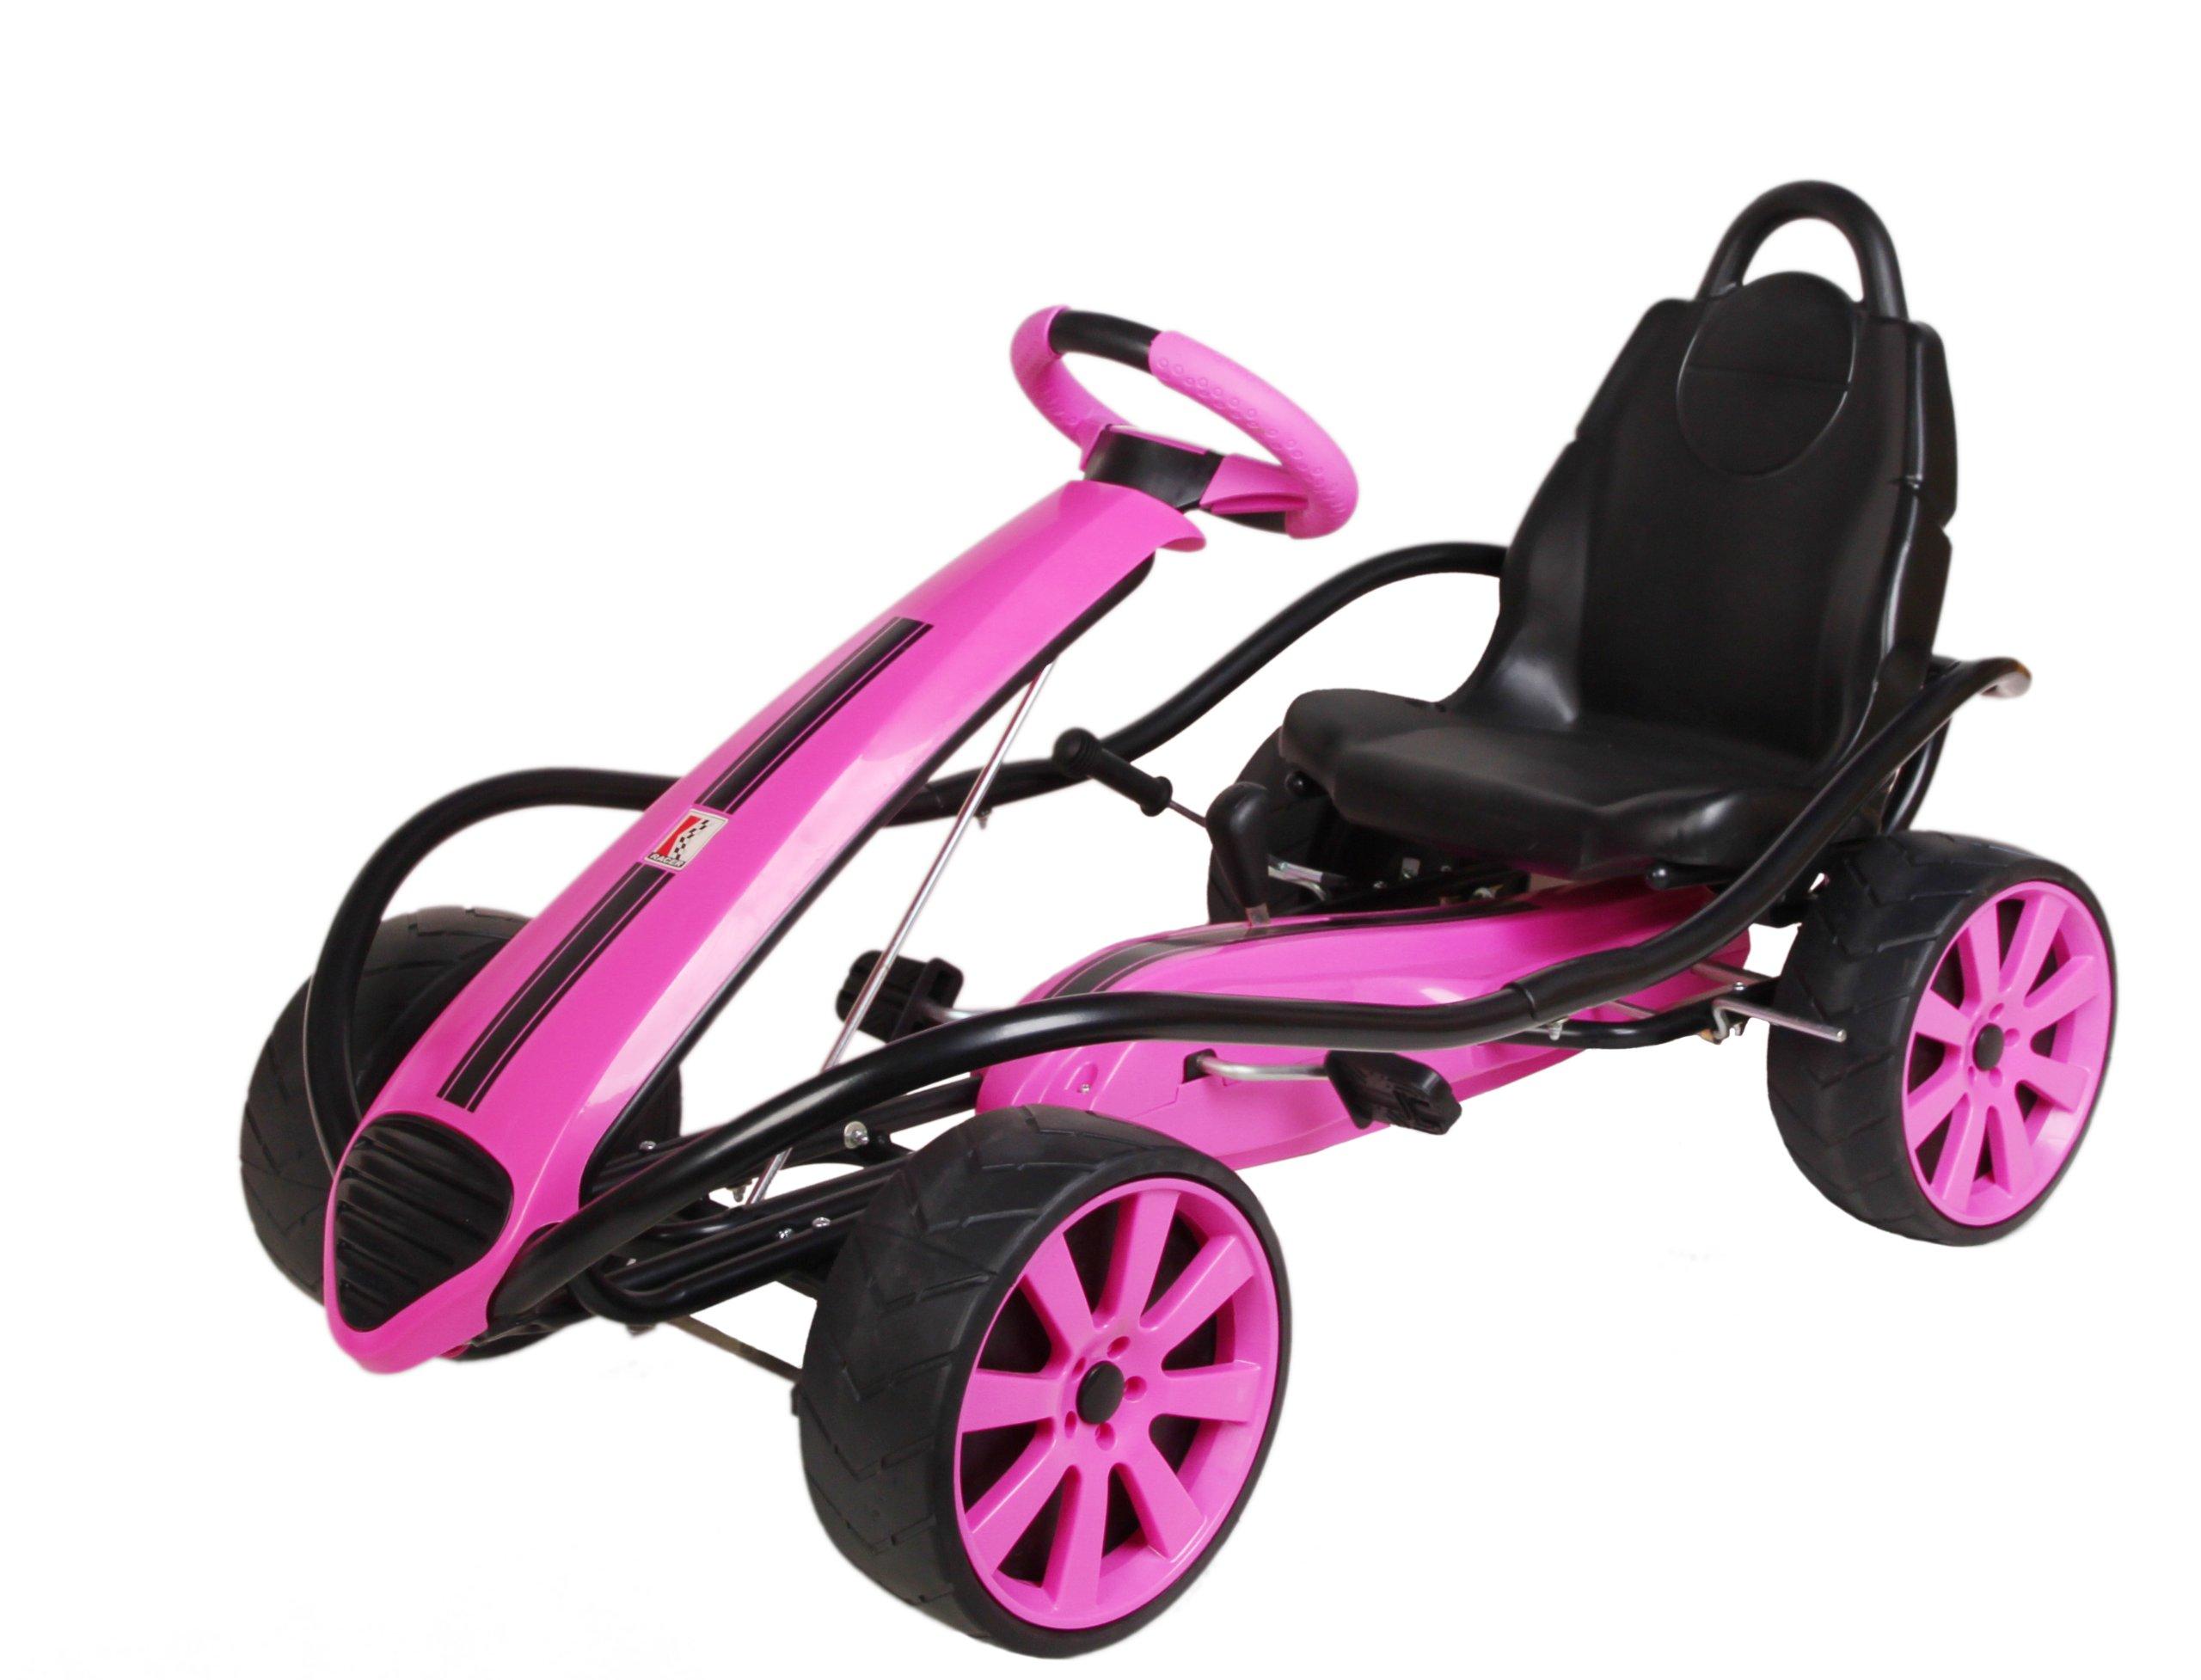 Kiddi-o by Kettler Sport Kid Racer Pedal Car, Pink by Kettler